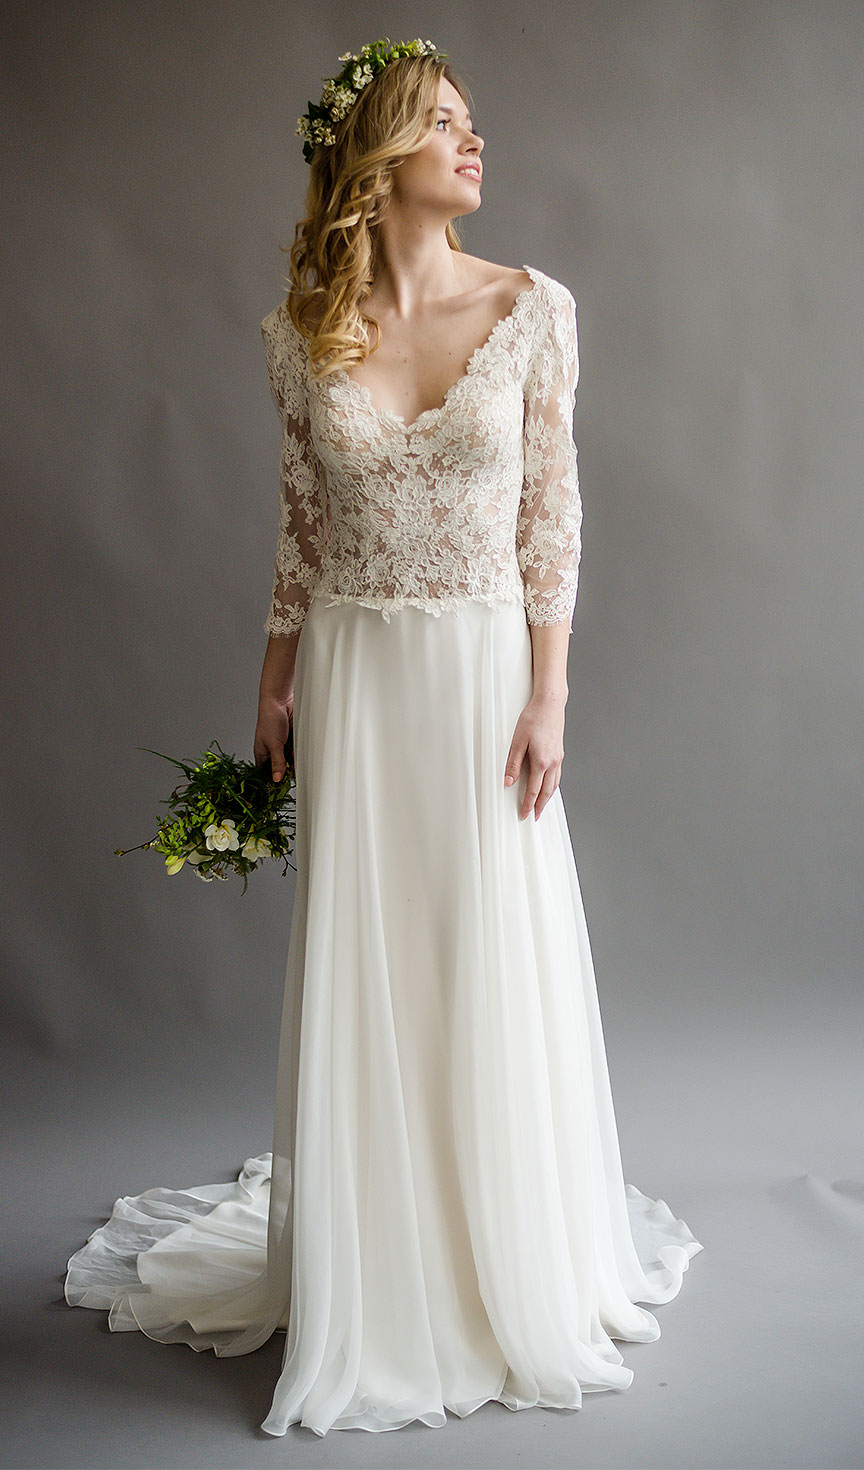 Alexia Mother of Bride Dresses